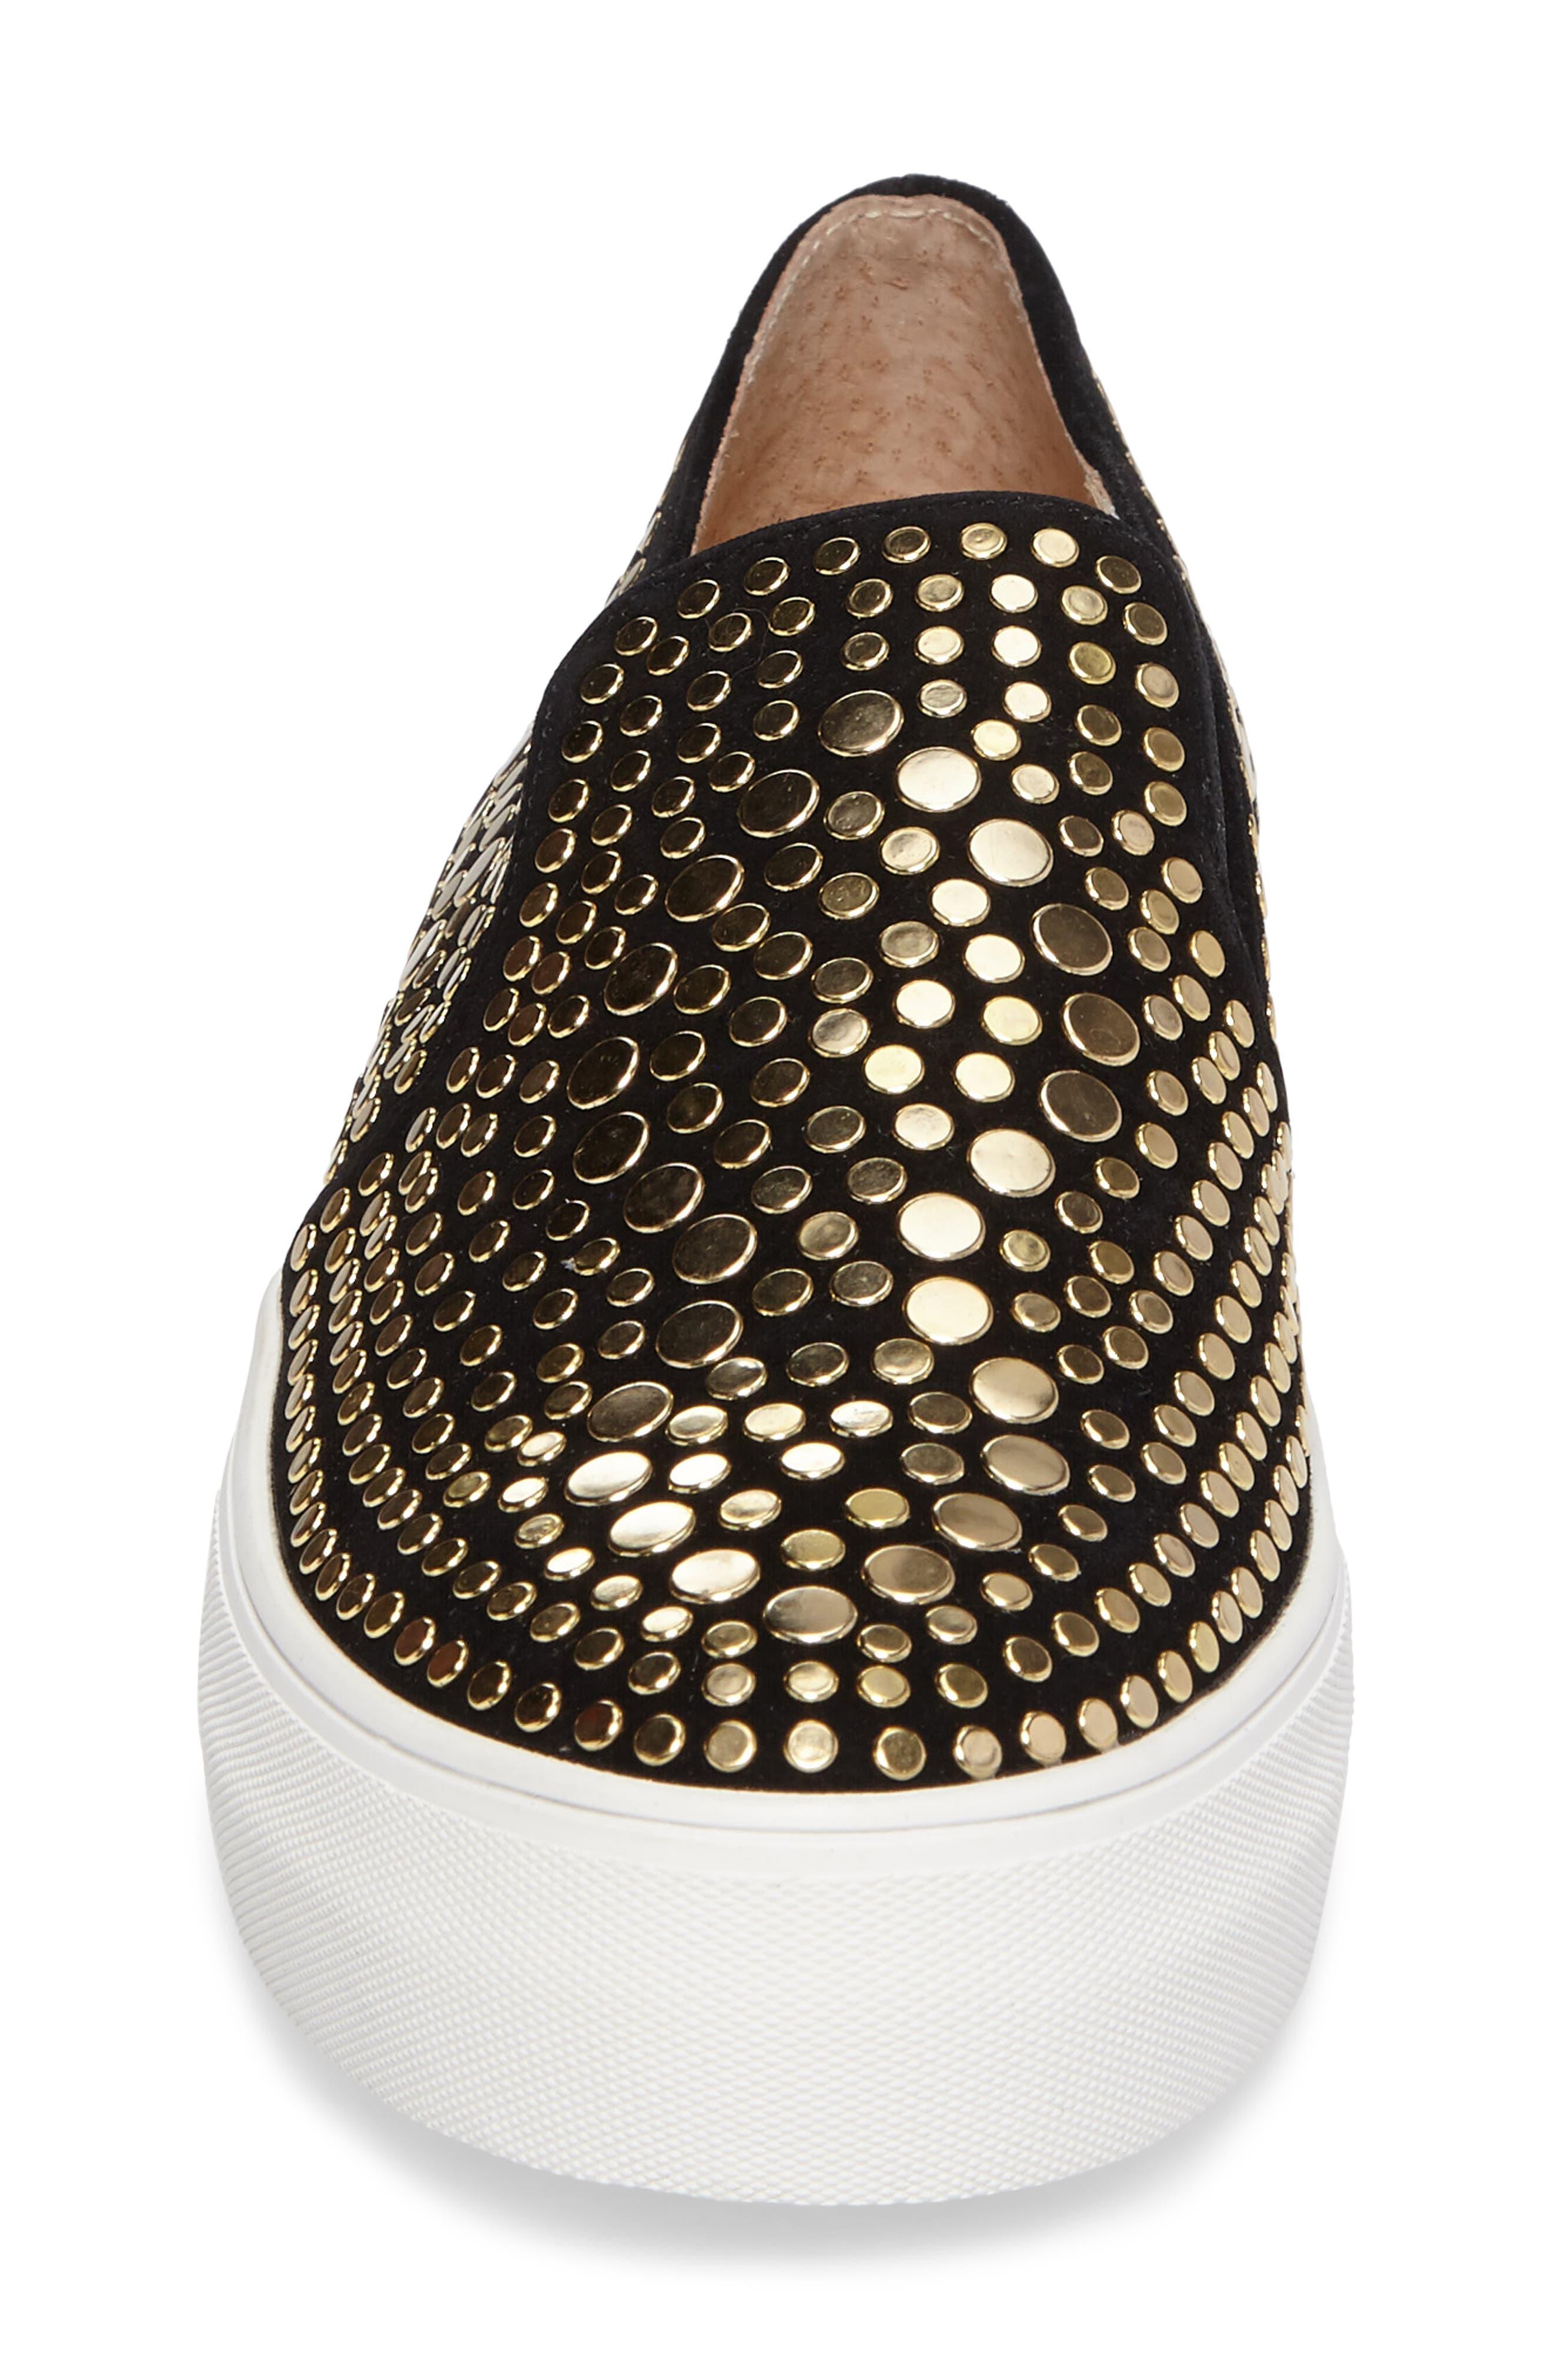 Kindra Stud Slip-On Sneaker,                             Alternate thumbnail 4, color,                             002